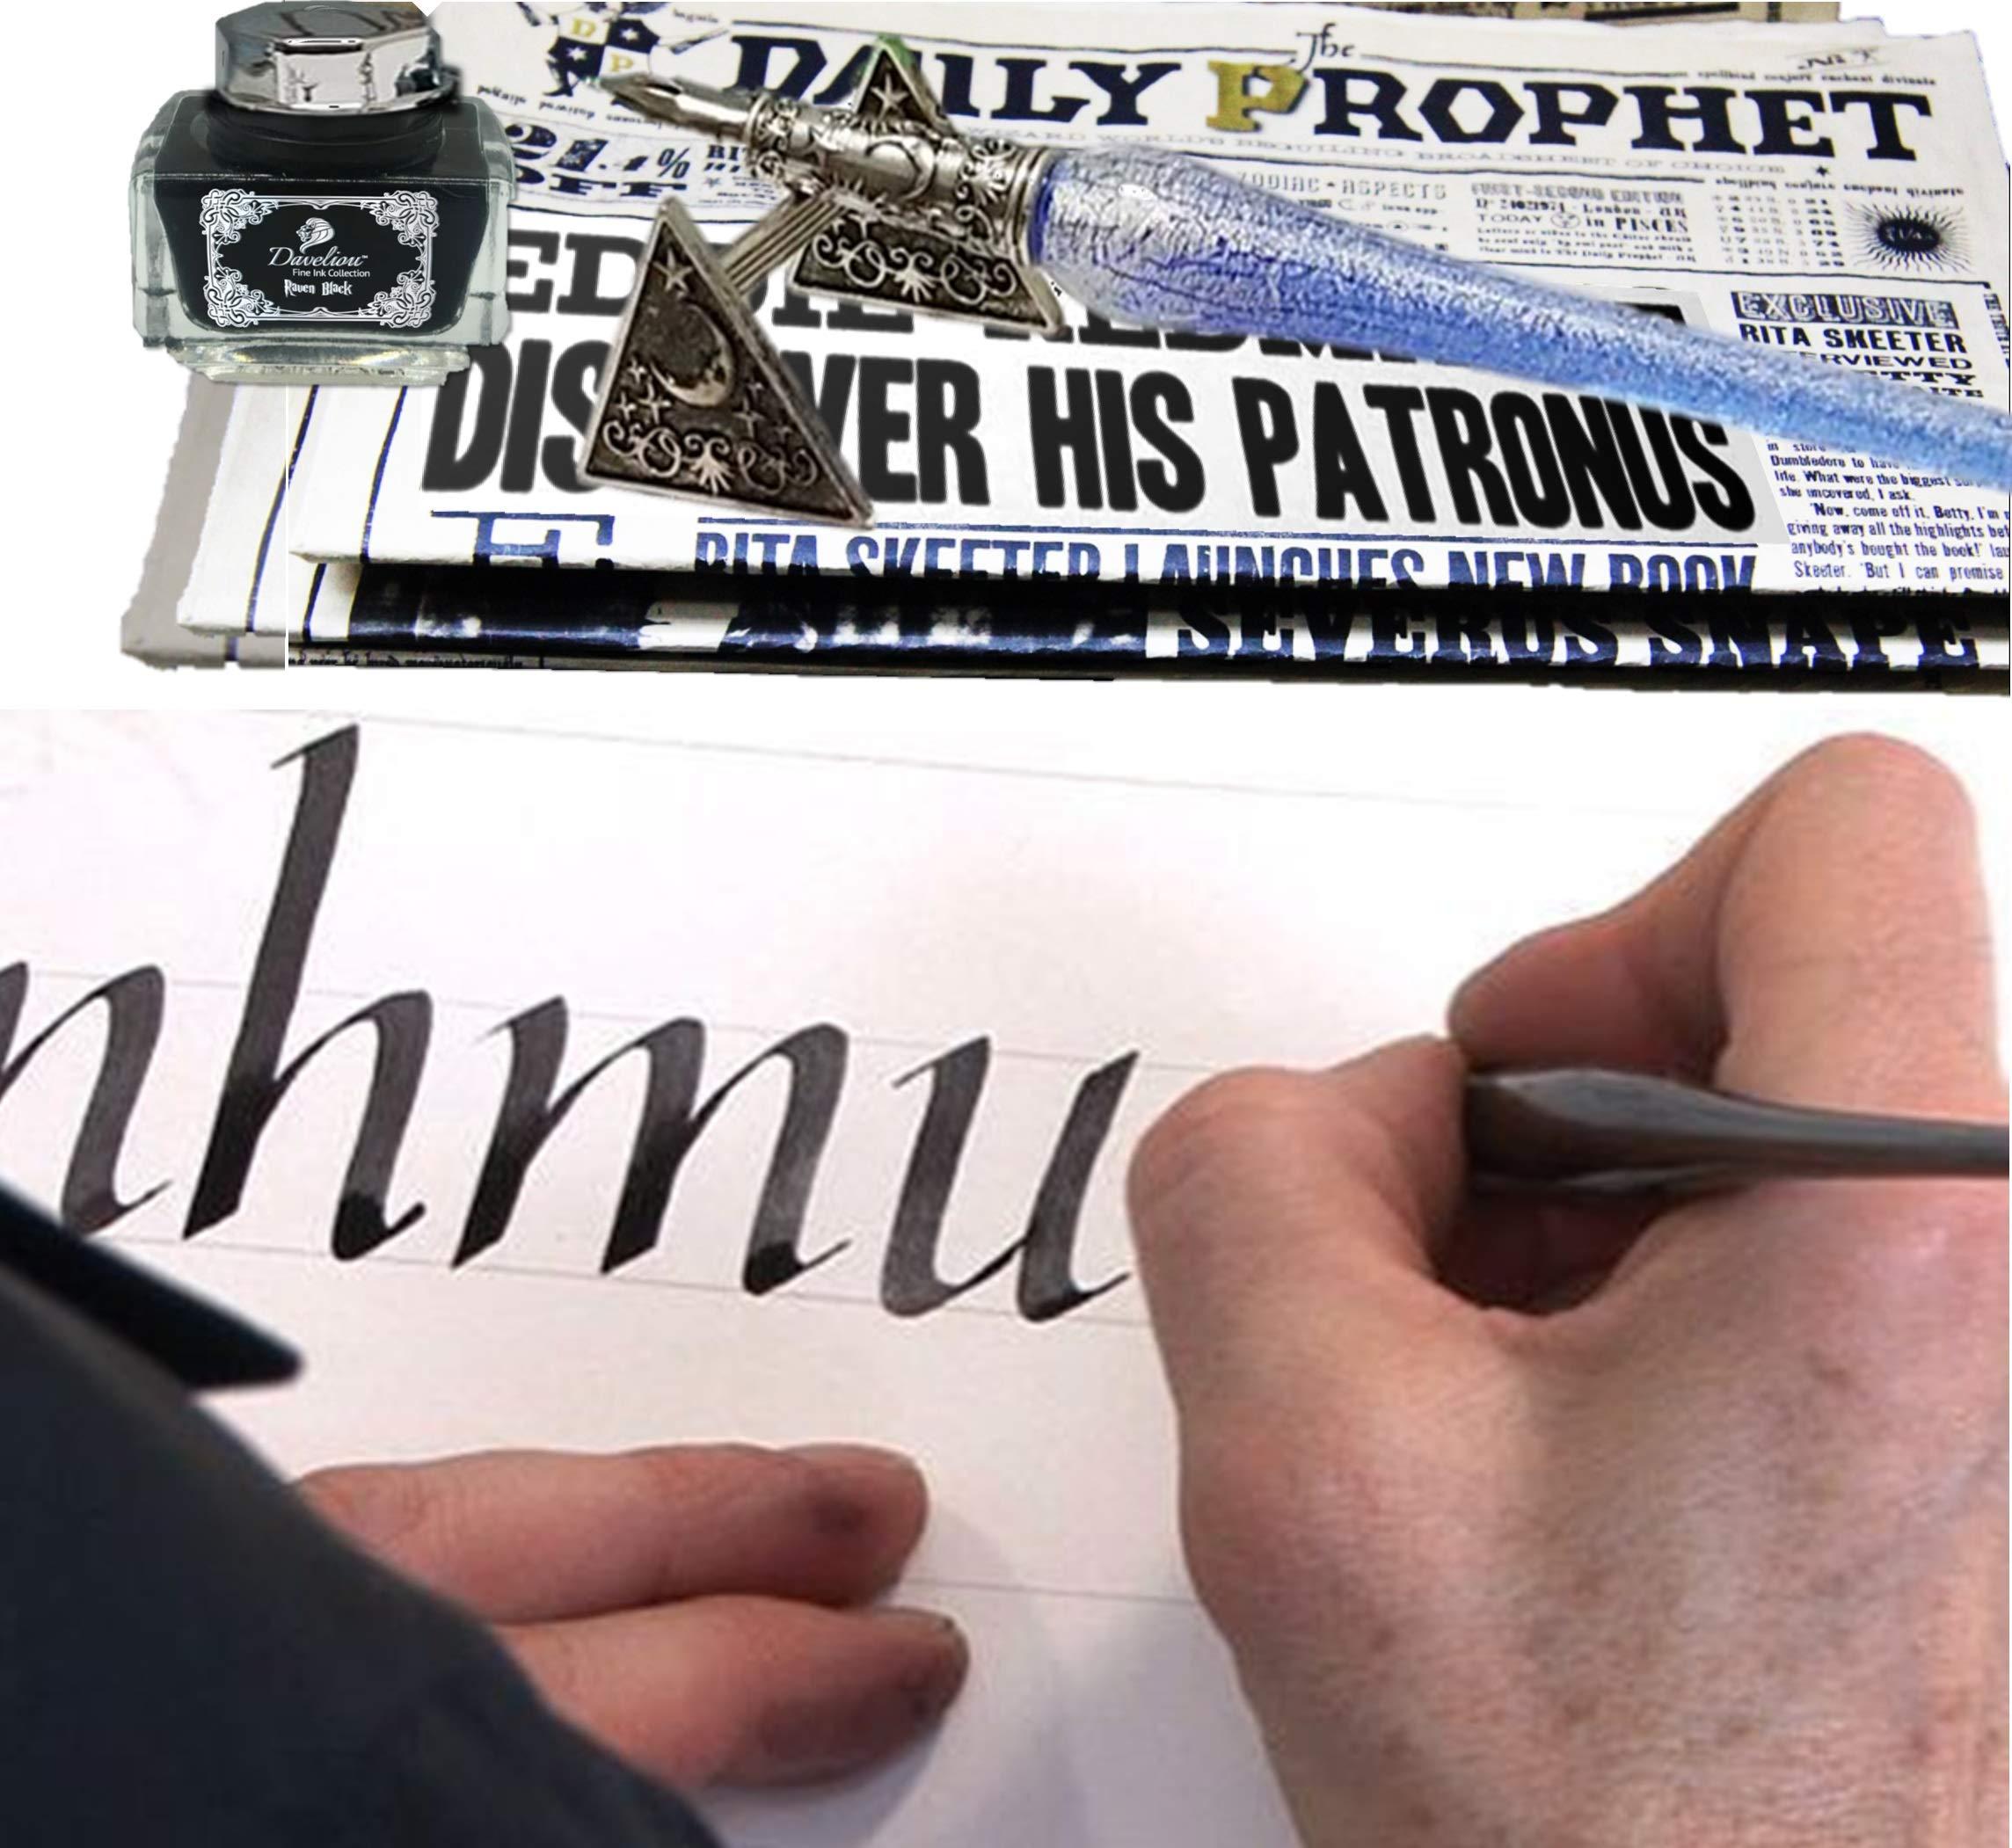 Daveliou Calligraphy Pen Set - 17-Piece Kit - Silver Leaf Blue Glass & Wooden Pens - 10 Nib & 4 Ink Set - Superior Control by Daveliou (Image #7)